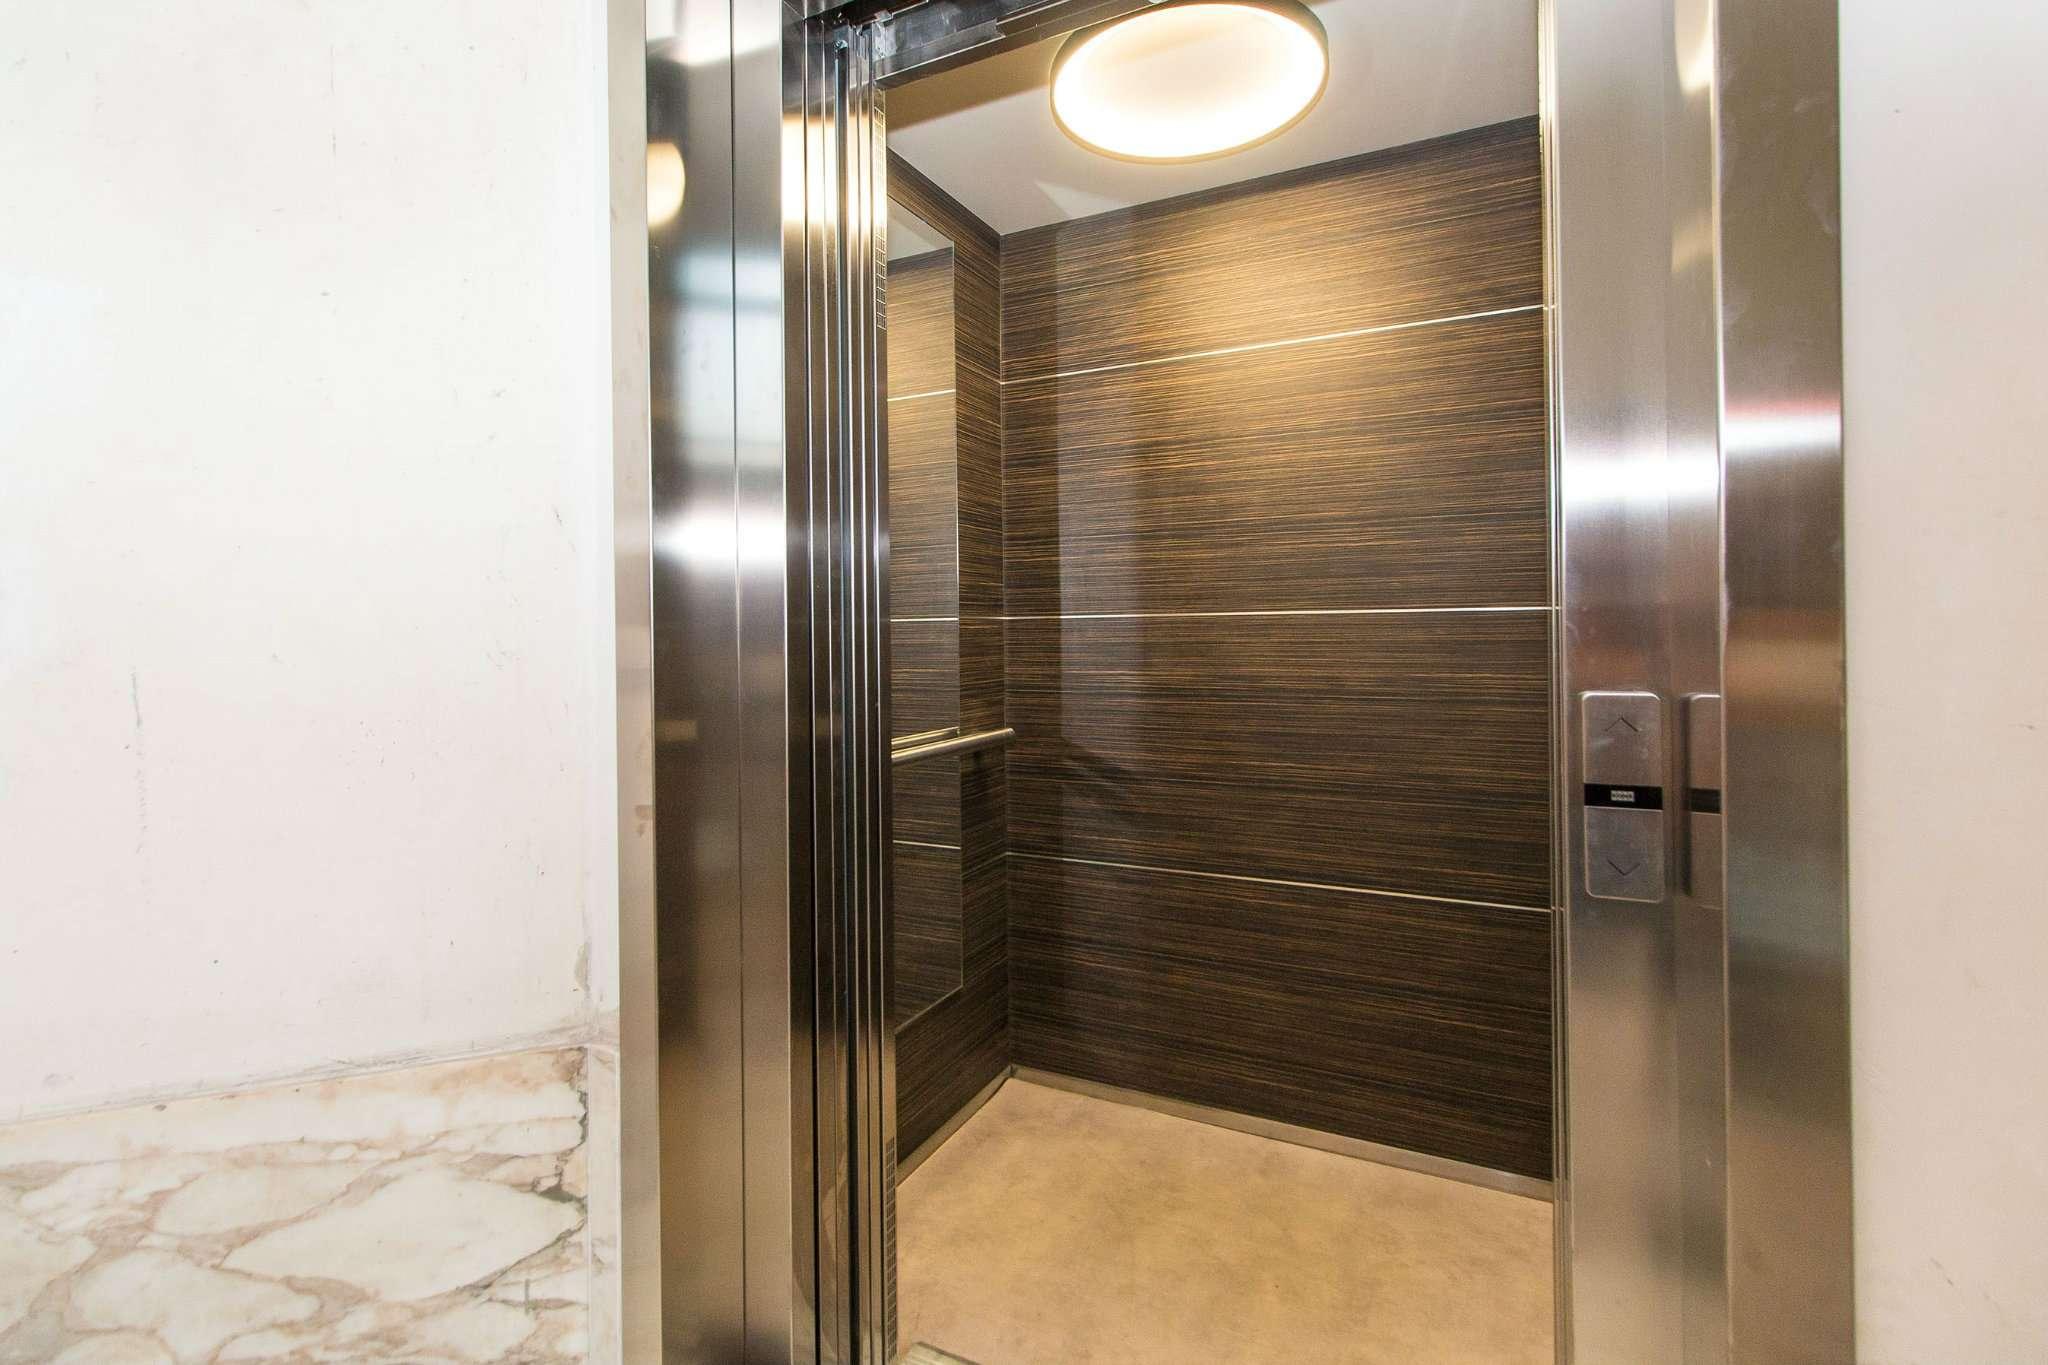 Torino Torino Vendita APPARTAMENTO >> alloggi vendita, appartamenti a torino